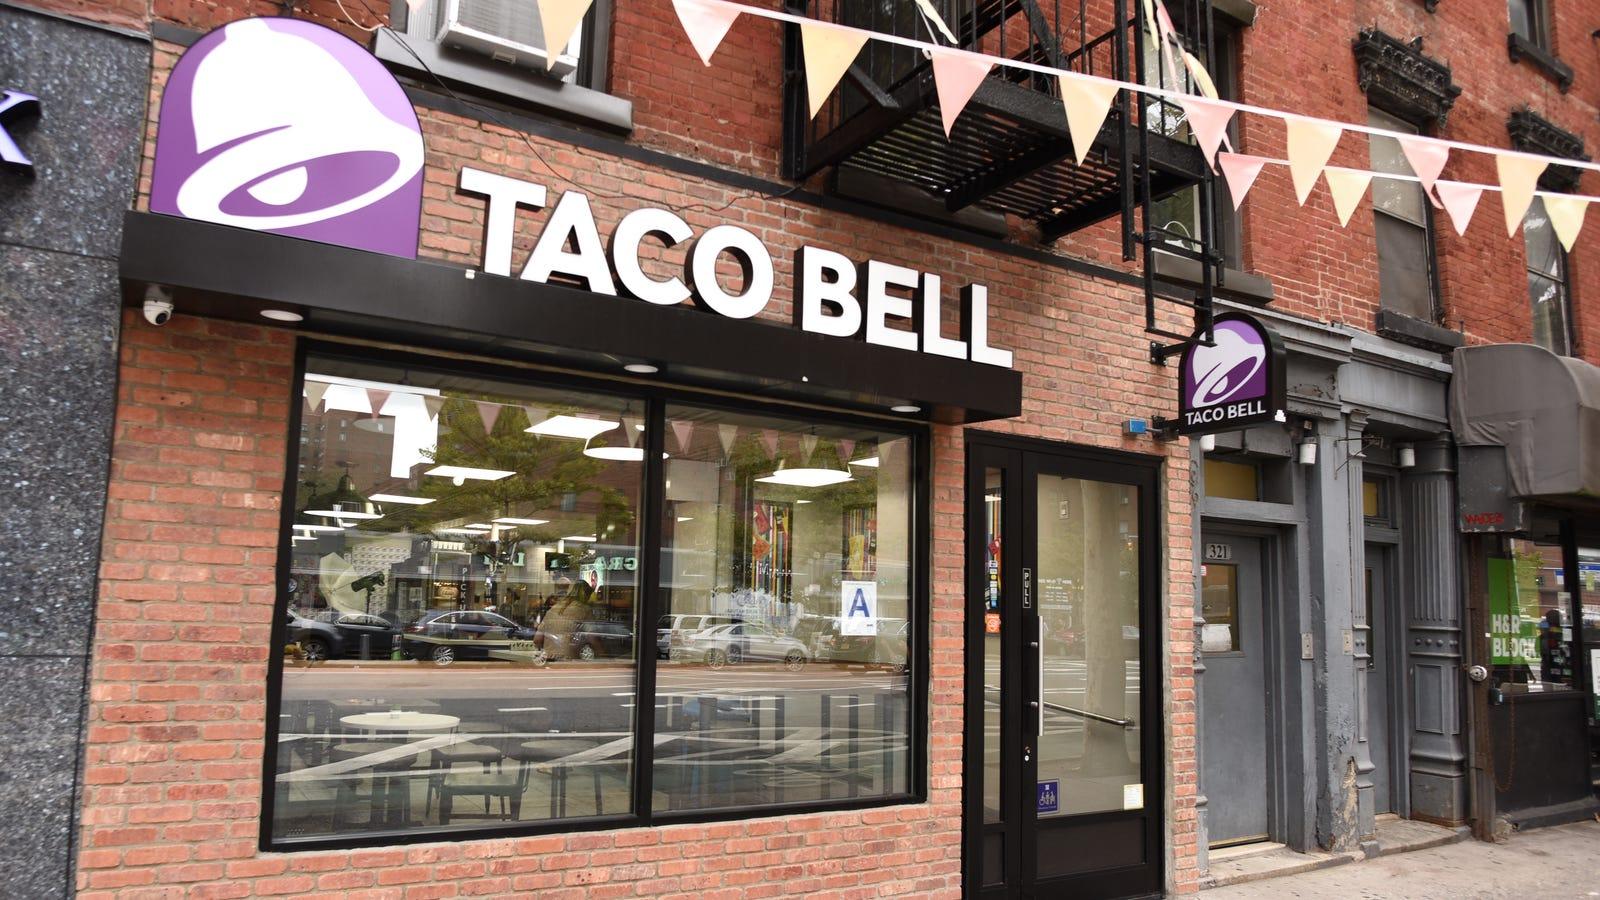 Taco Bell to test vegetarian menu this year